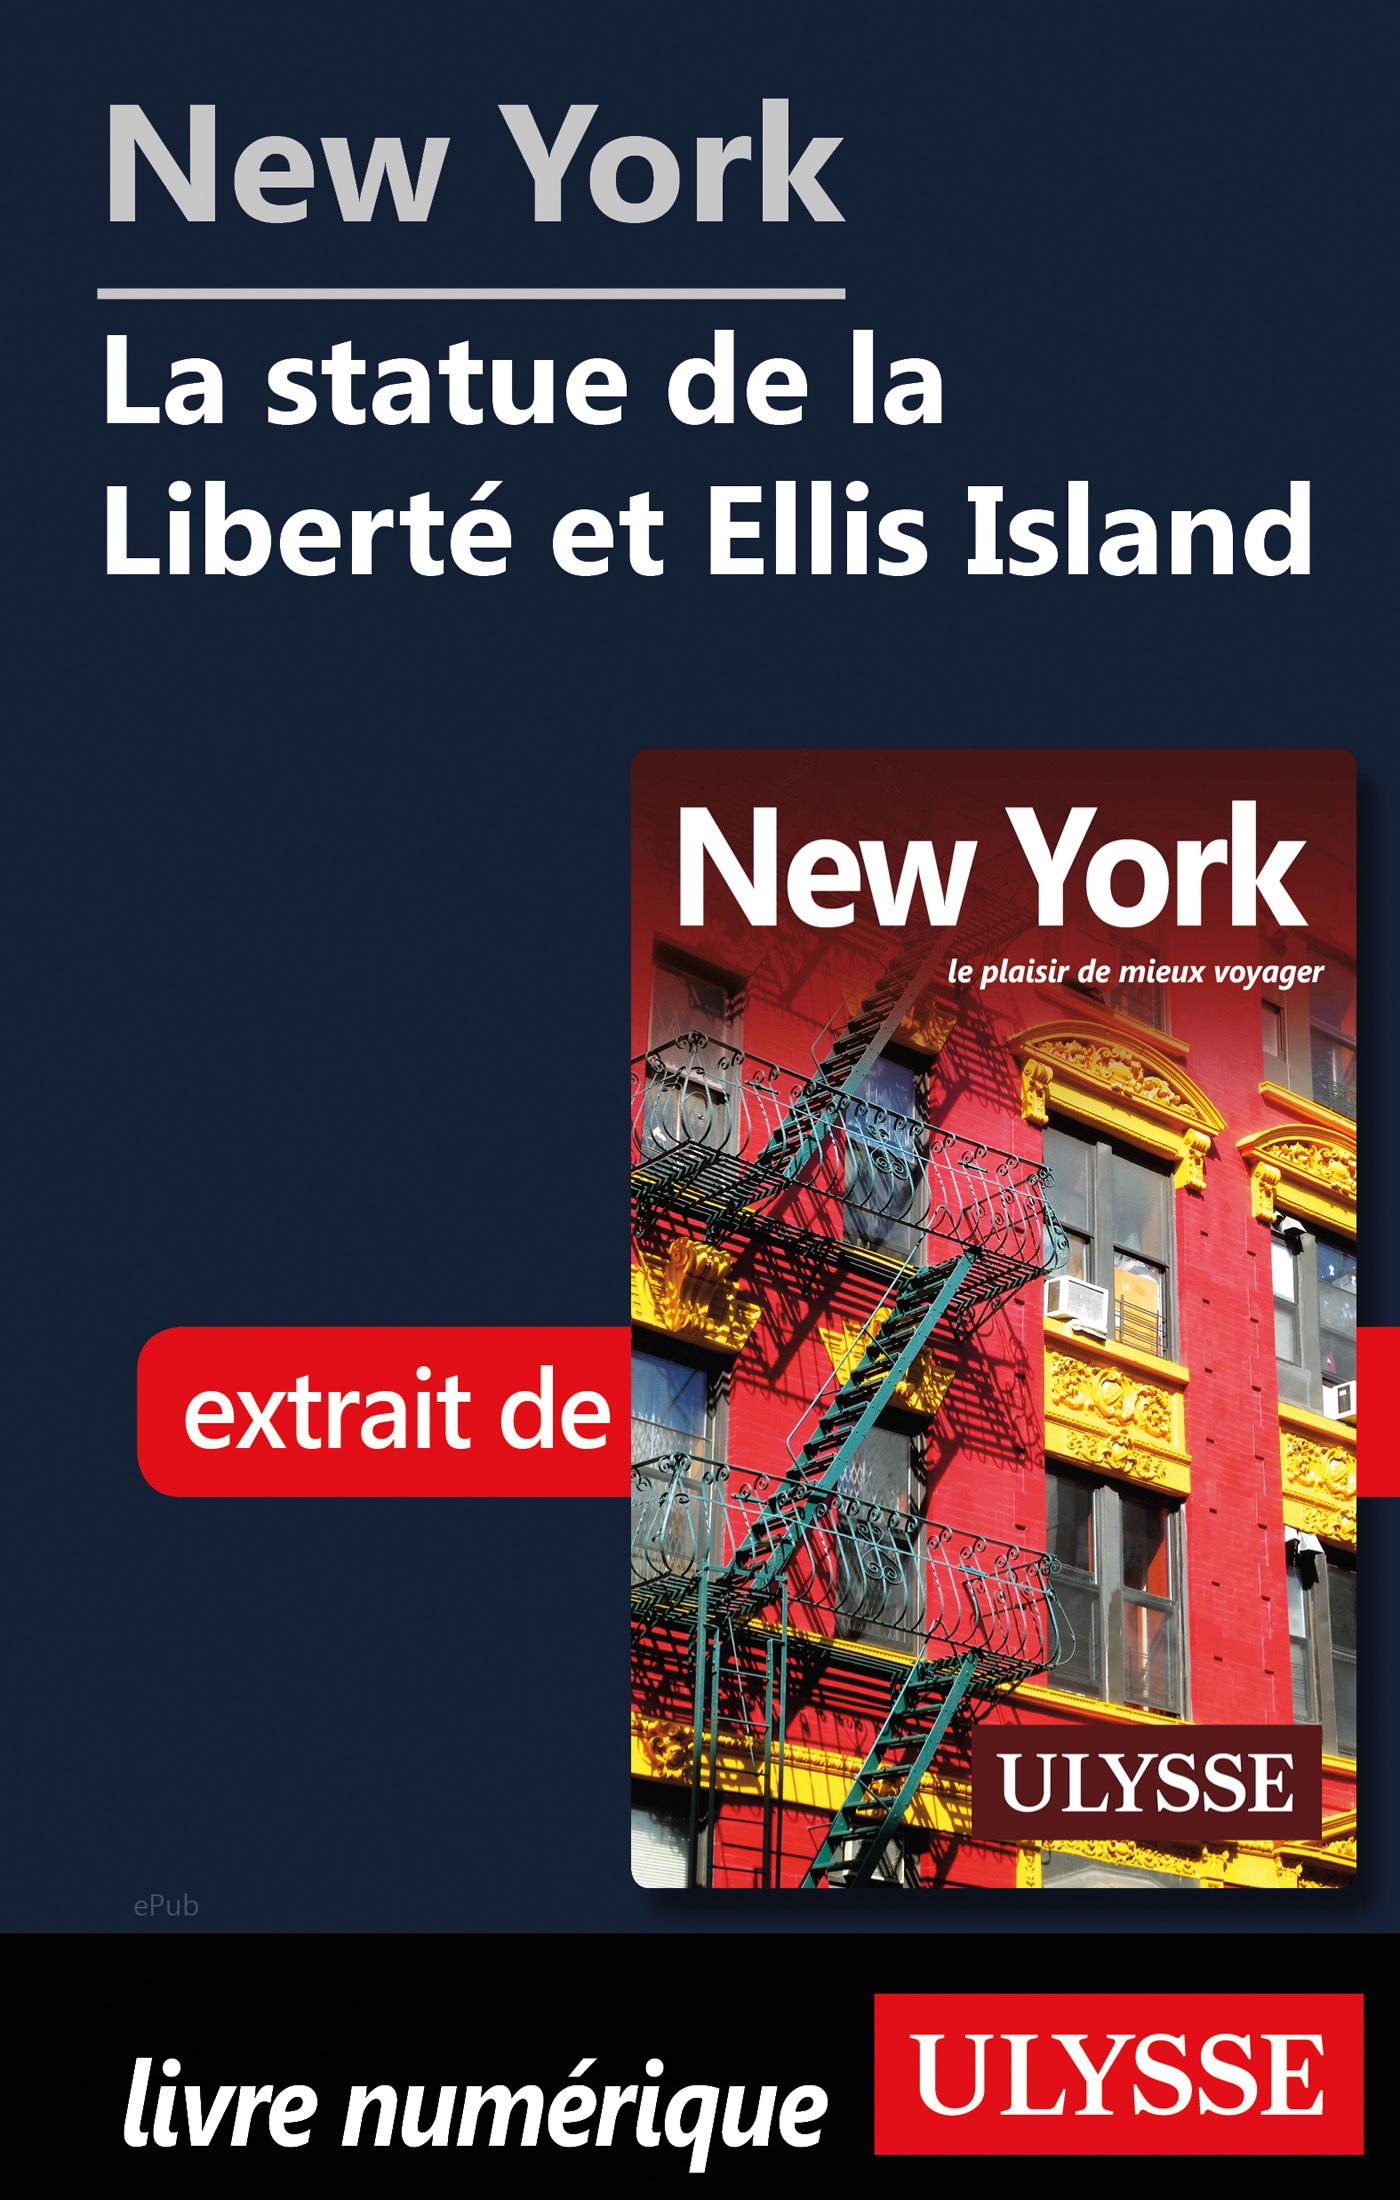 New York - La statue de la Liberté et Ellis Island